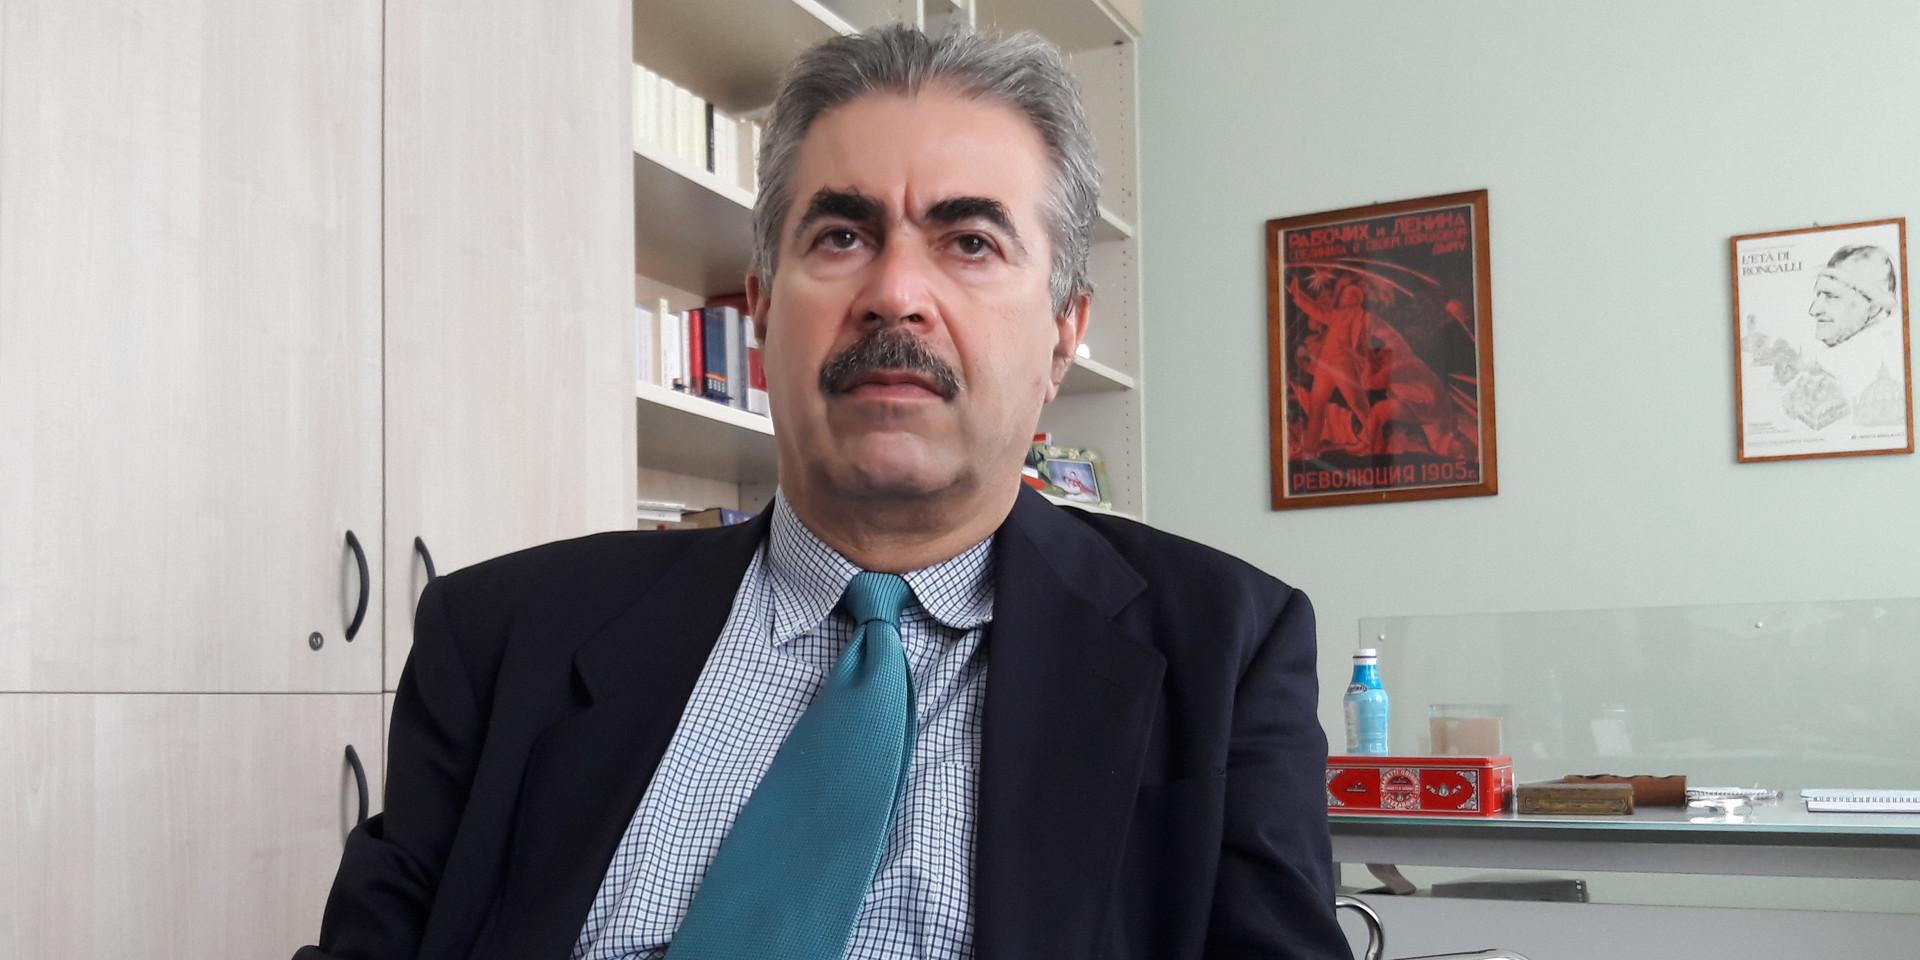 Pro-Rector Prof. Stefano Trinchese